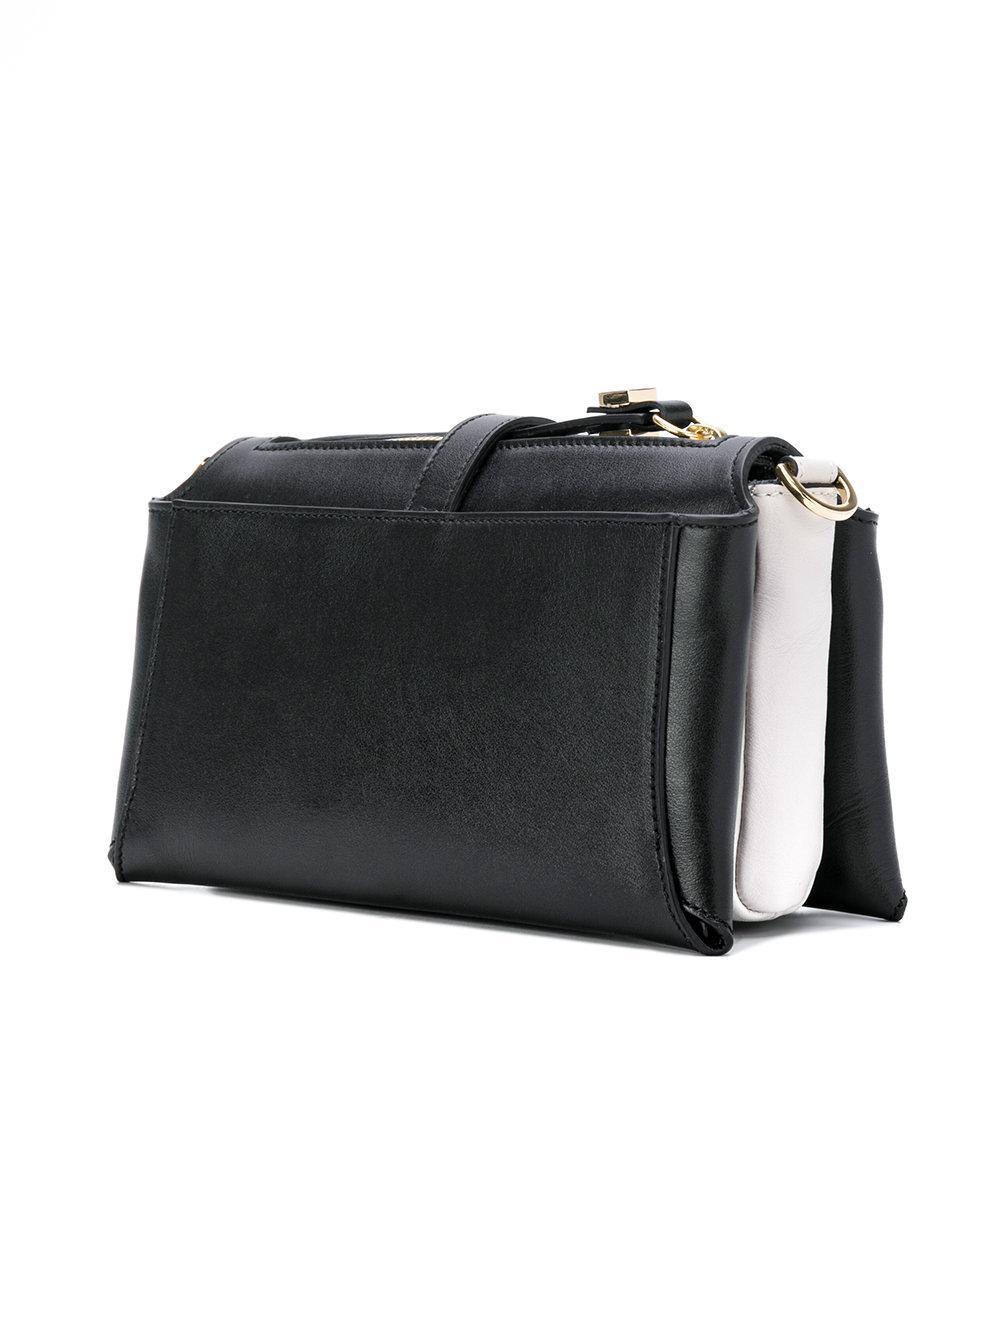 429b0da00cda Giancarlo Petriglia - Black Multiple Compartments Shoulder Bag - Lyst. View  fullscreen